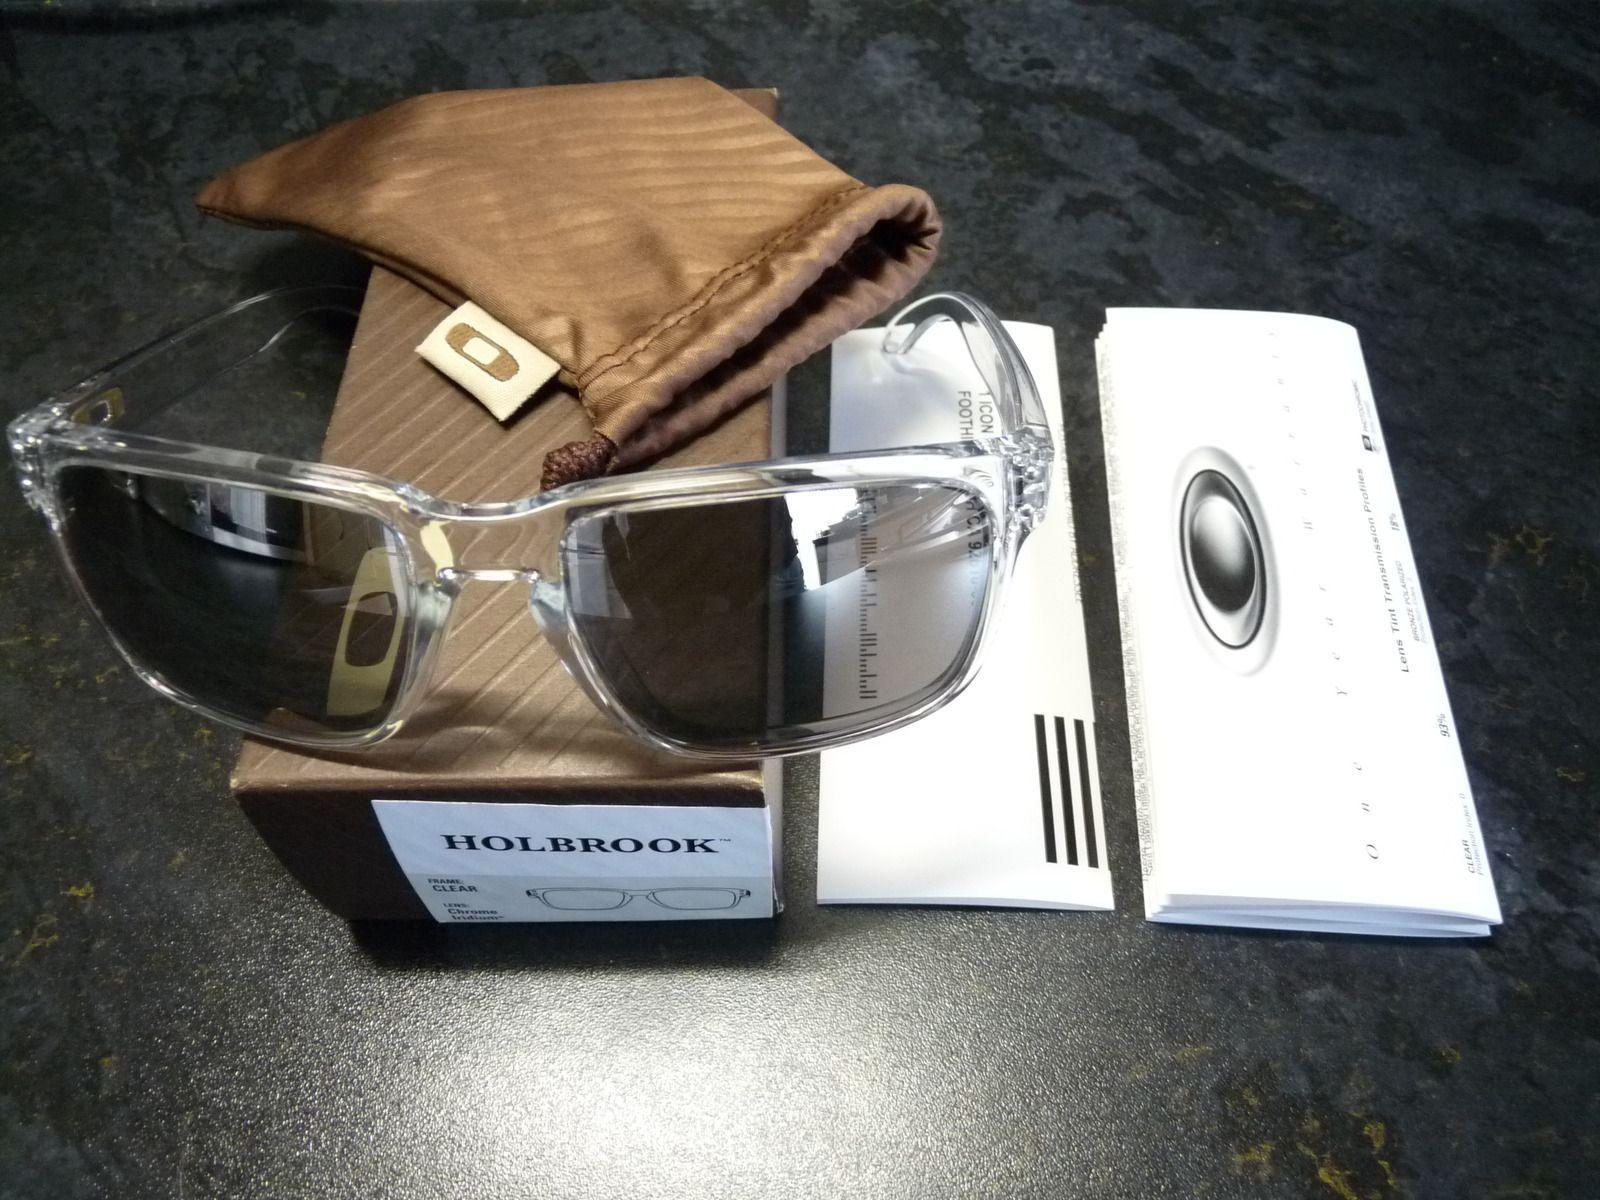 Holbrook Polished Clear With Chrome Iridium - LNIB - For Sale Or Trade - p1080780lv.jpg